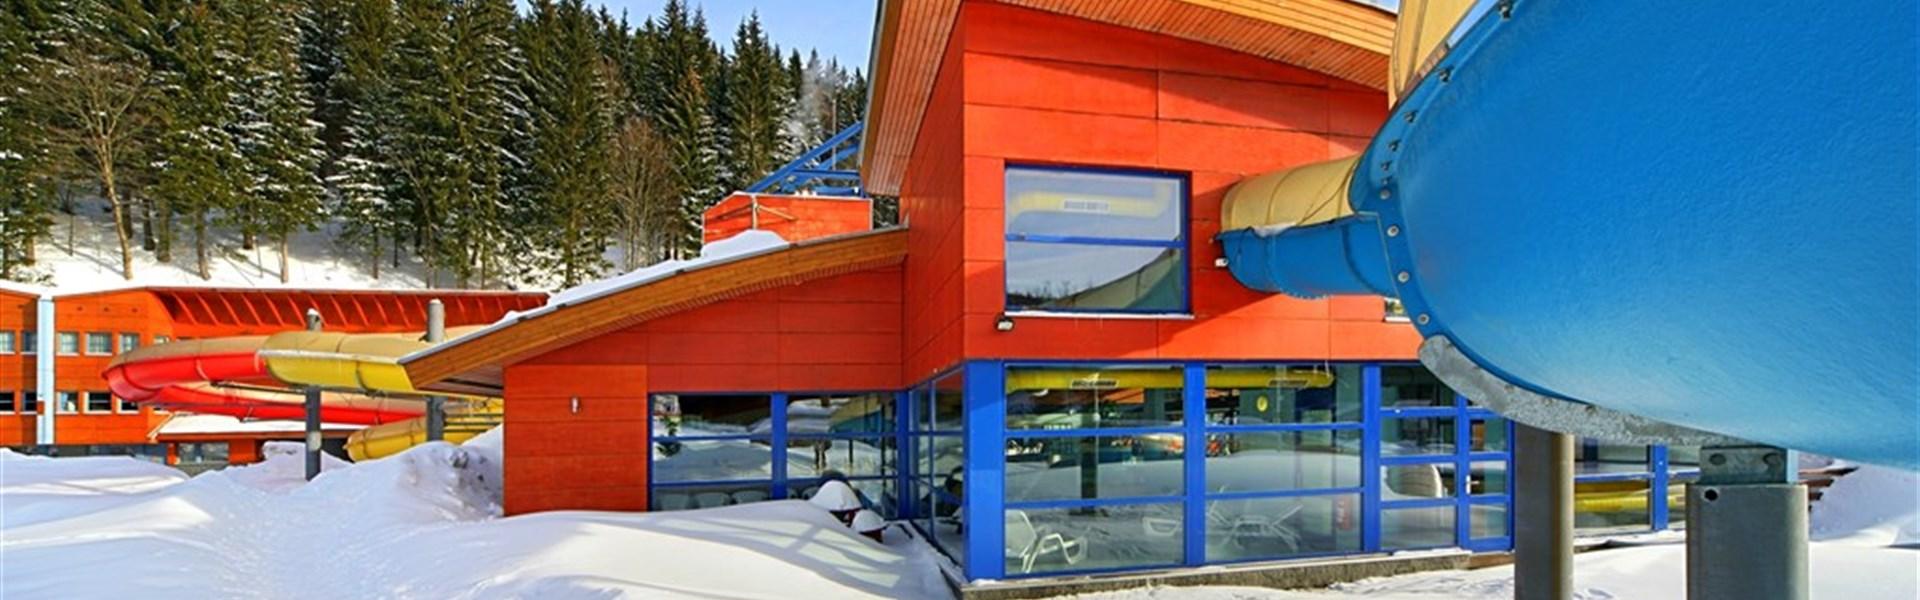 Hotel Aquapark - zima -